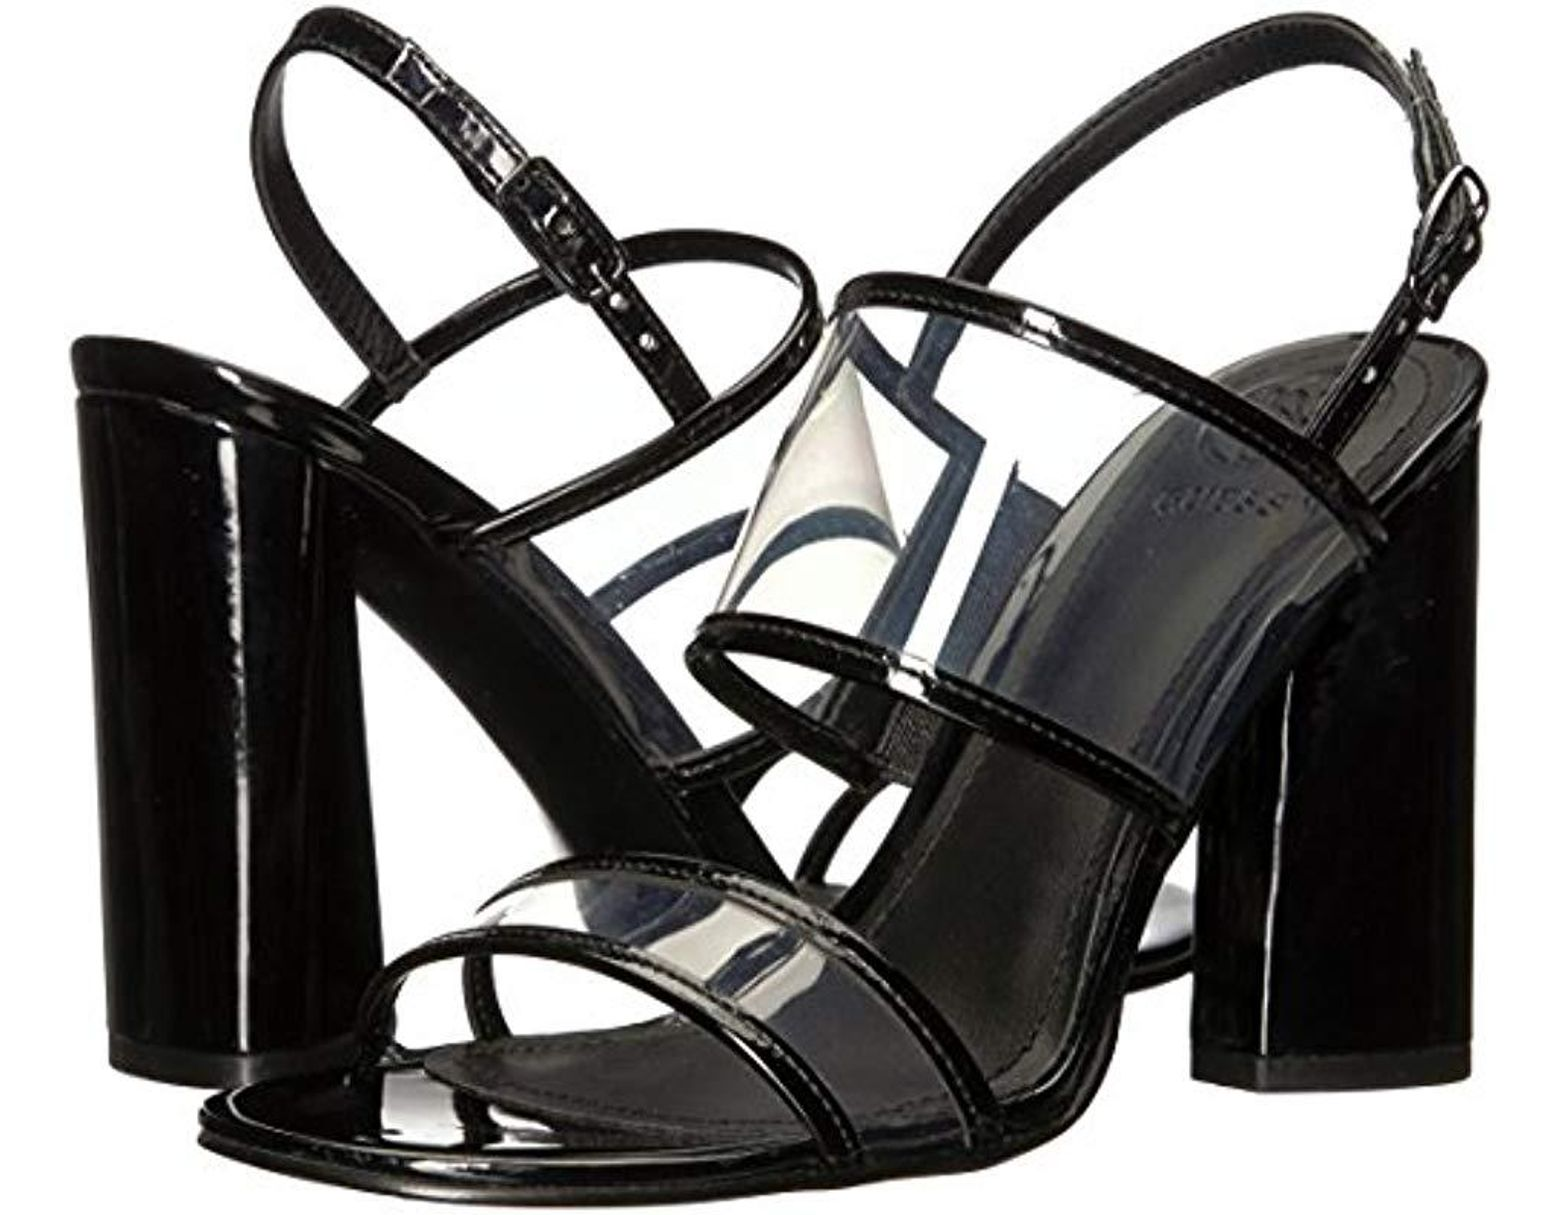 Women's Sandal Women's Black Amidala Heeled Amidala Black 4q5LA3Rj